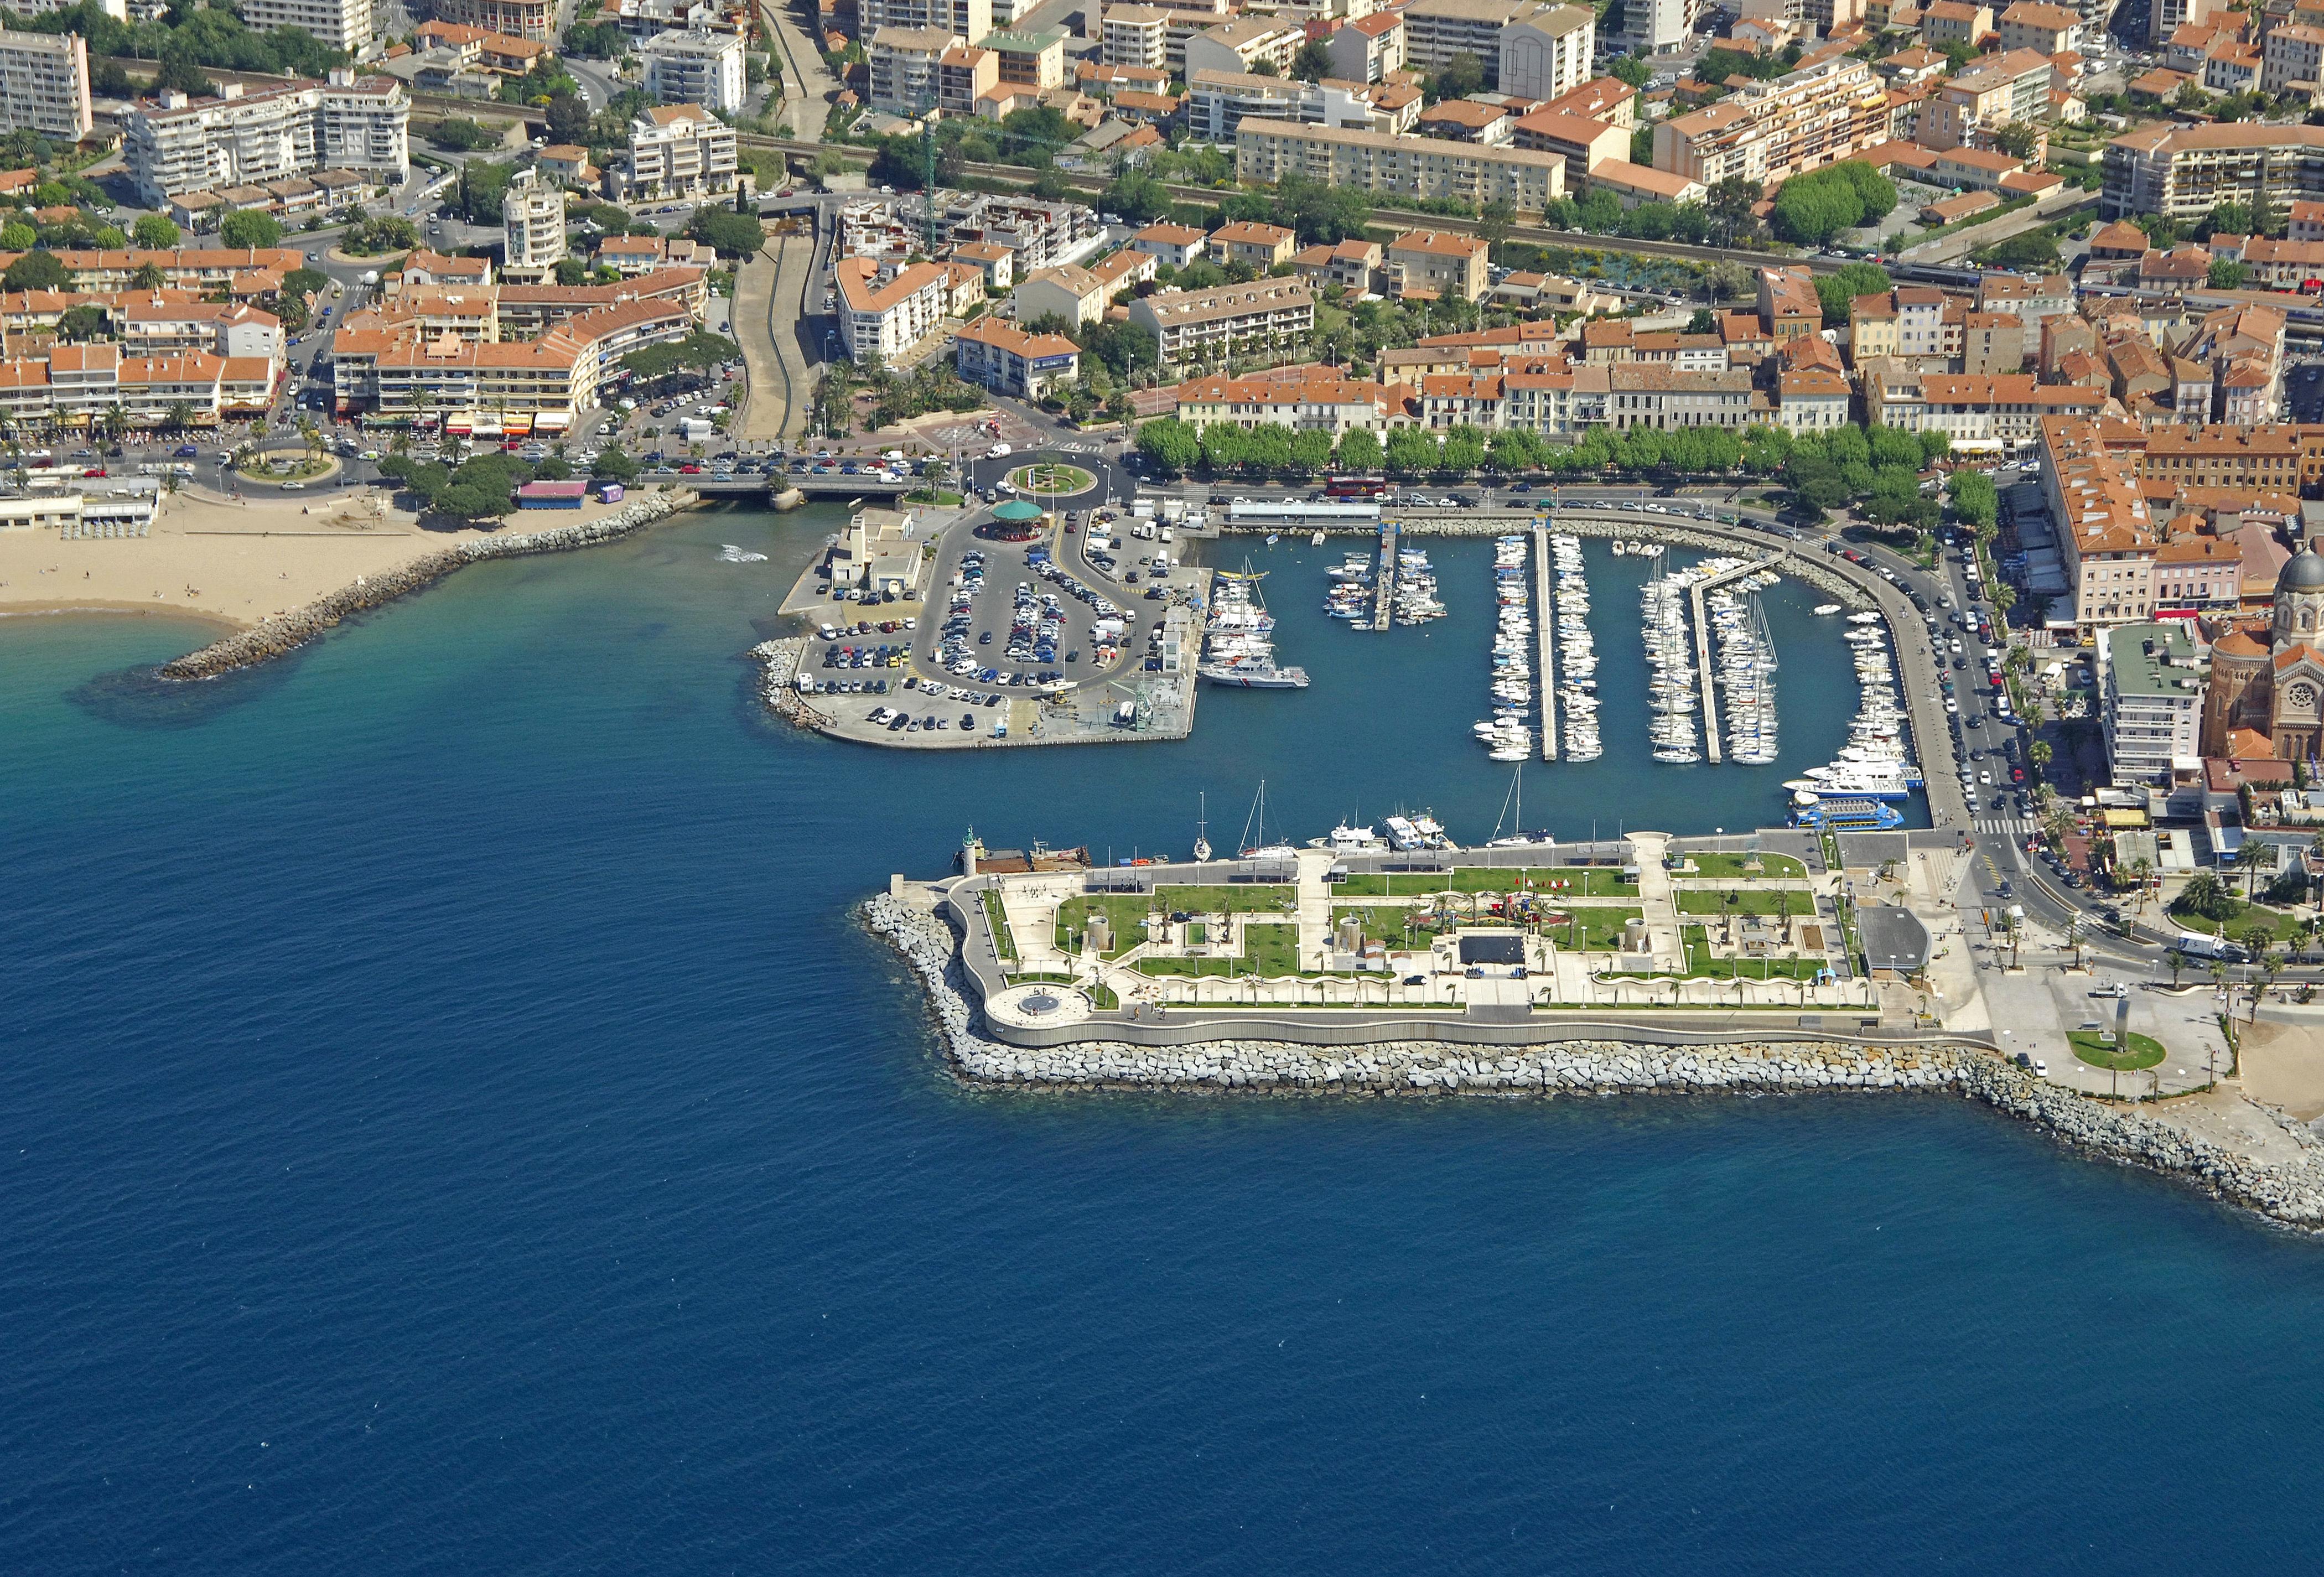 Vieux port st raphael in saint raphael france marina - Restaurants port santa lucia saint raphael ...